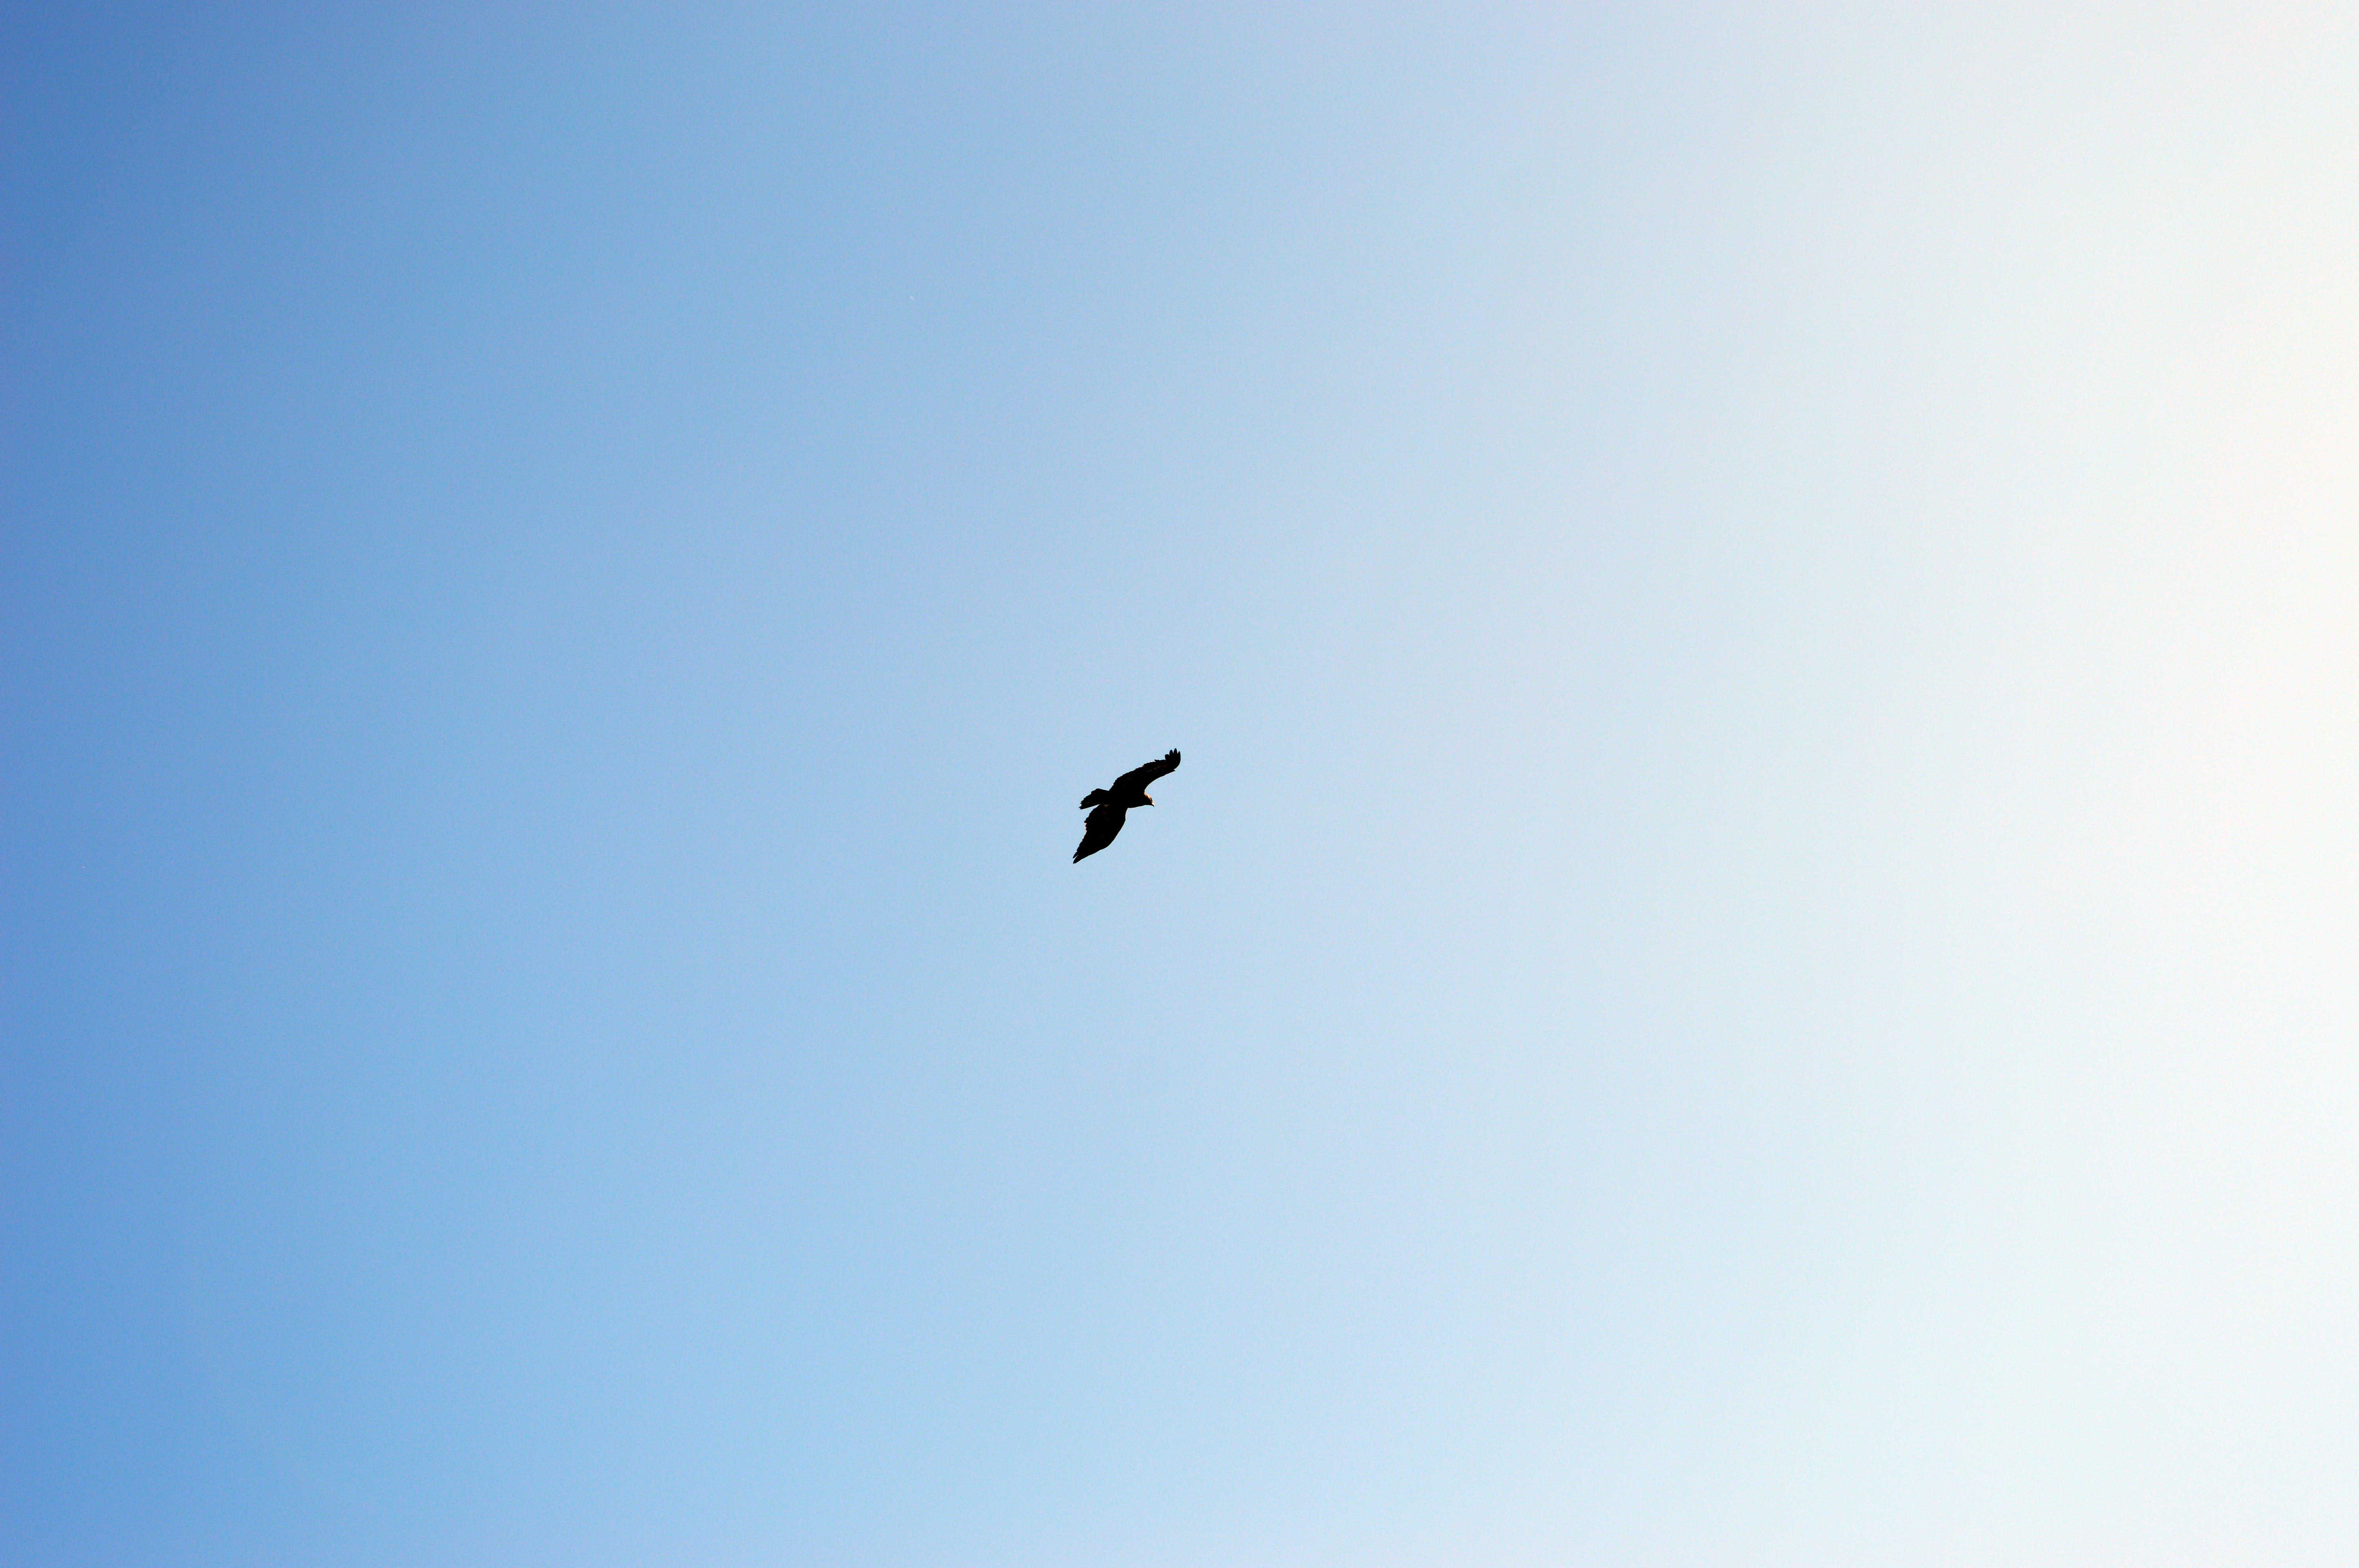 Free stock photo of blue sky, clear sky, eagle, kite